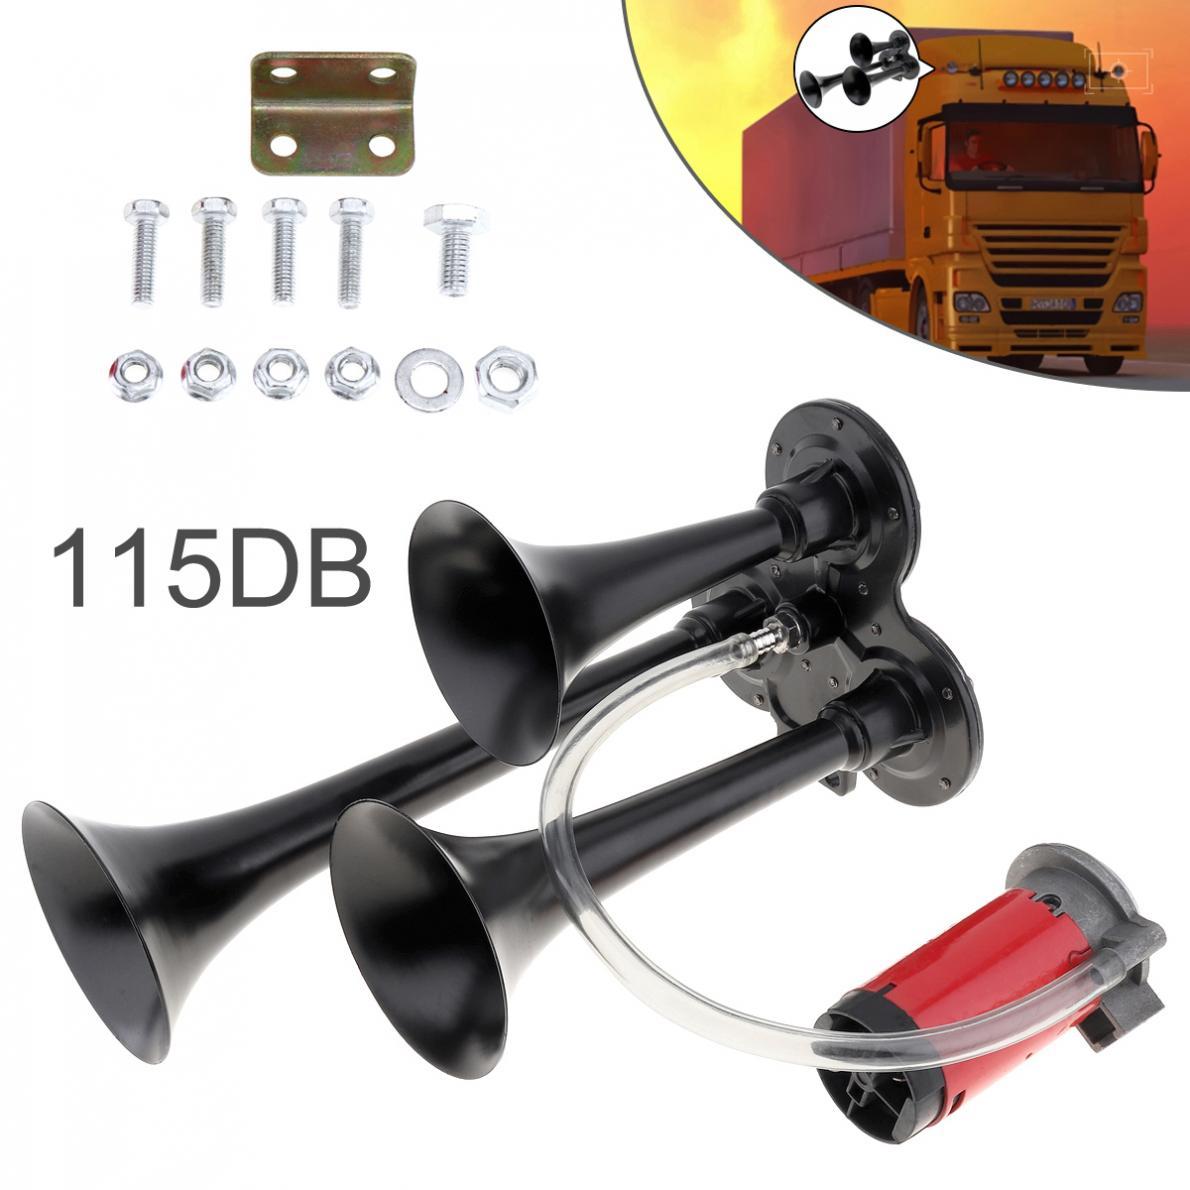 12V 115dB Super Loud Triple Tone Durable Air Horn Set Trumpet Compressor for Motorcycle Car Boat Truck